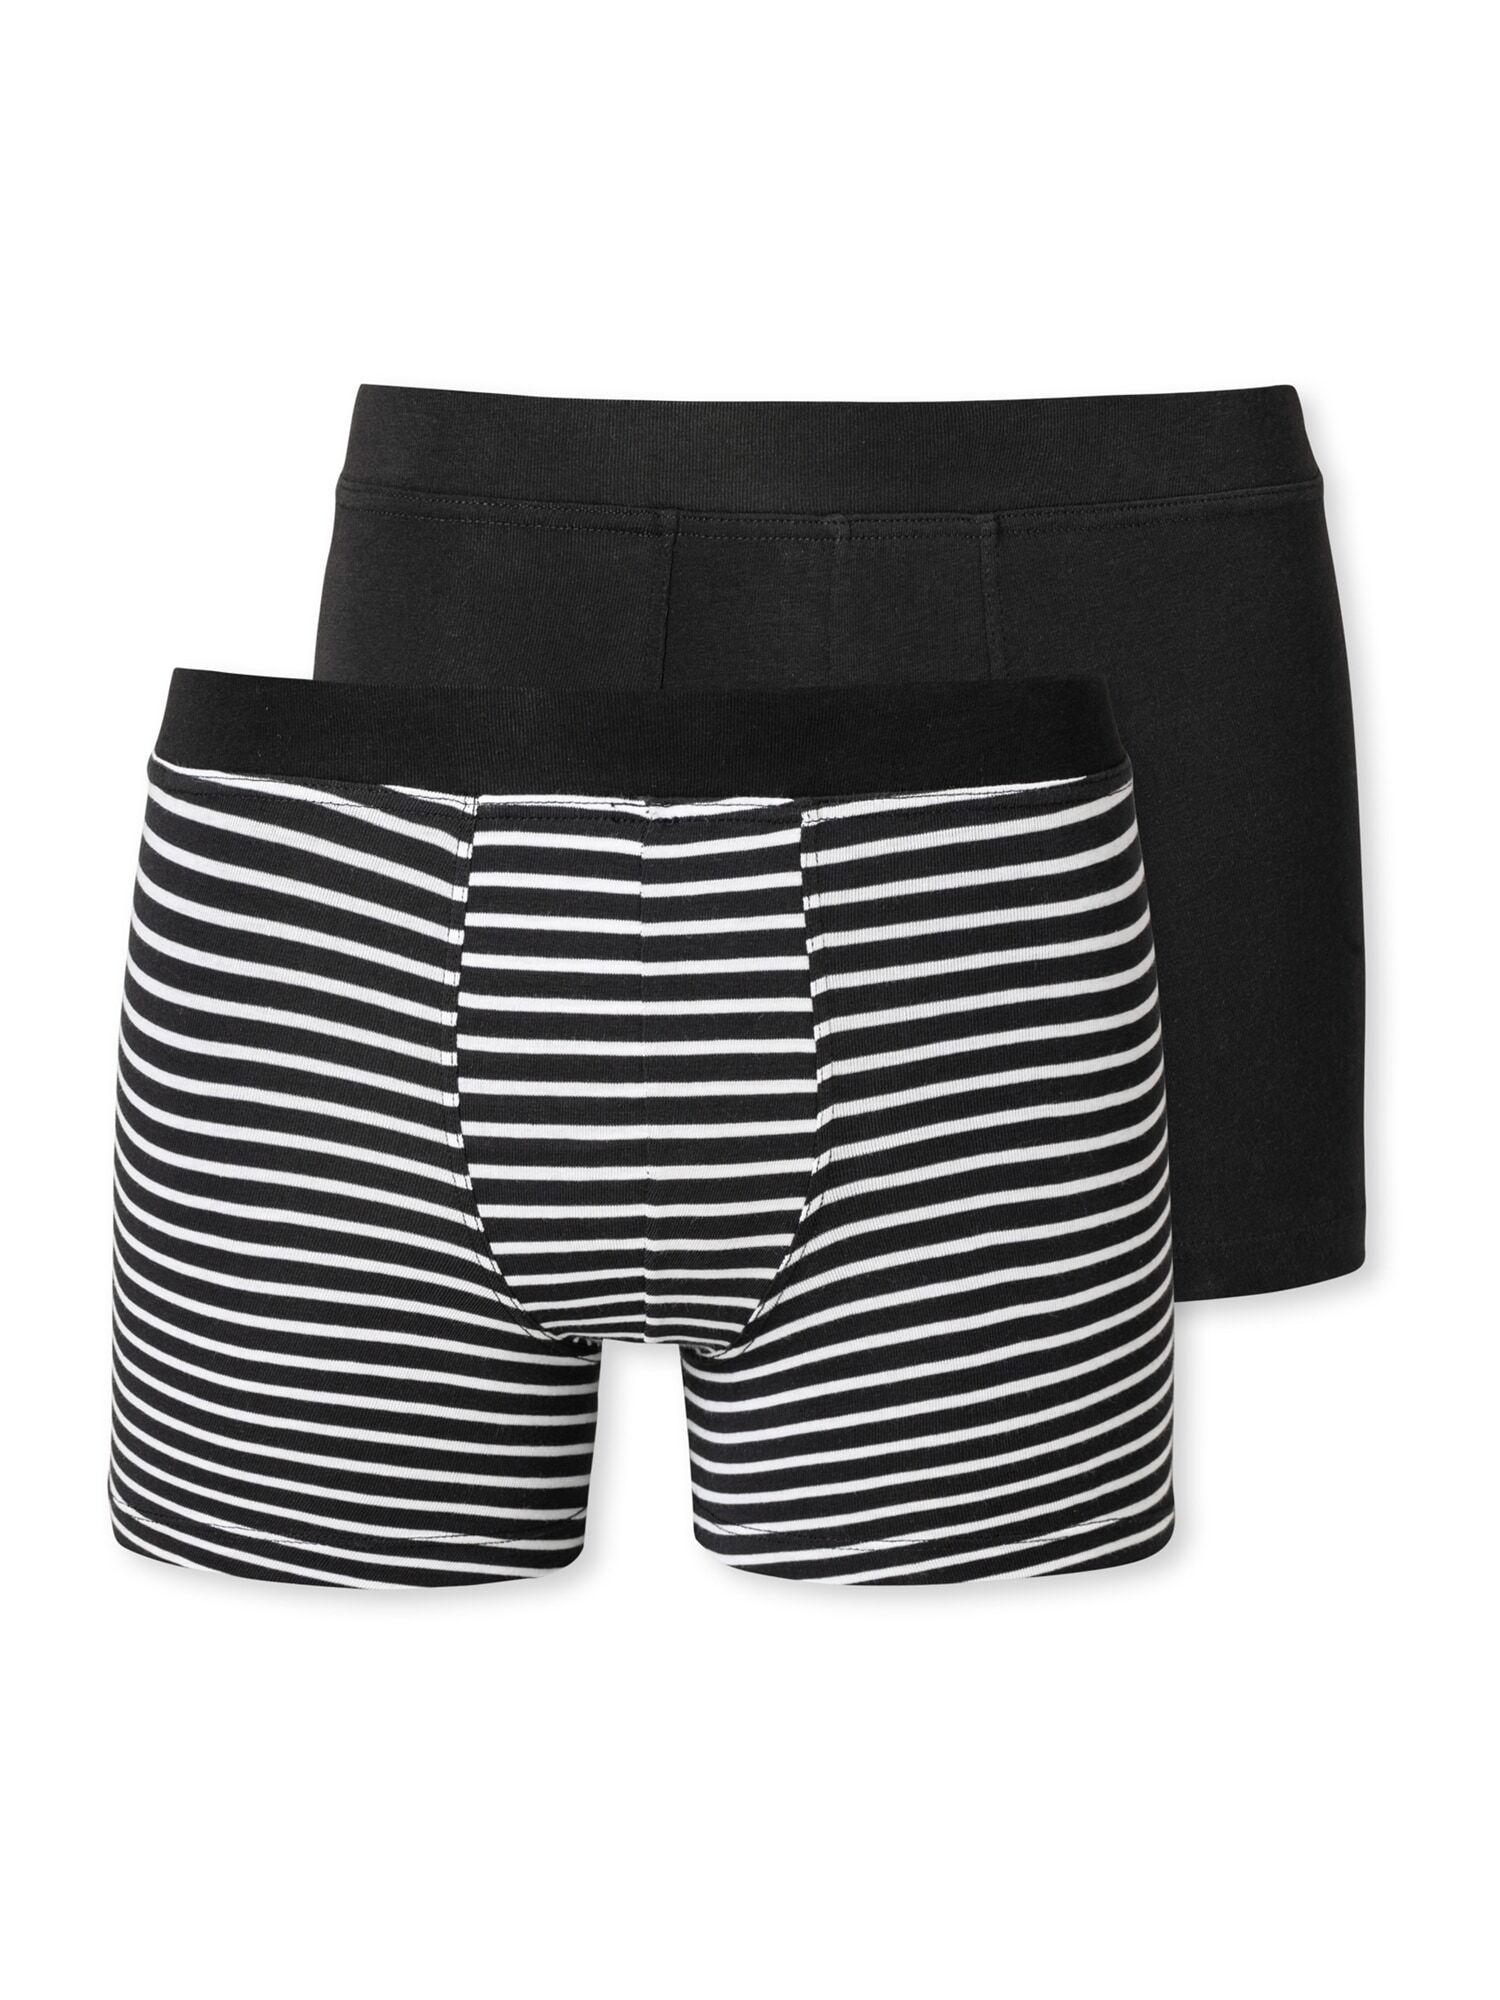 SCHIESSER Sous-vêtements ' 2er-Pack Basic Kids '  - Noir - Taille: 176 - boy